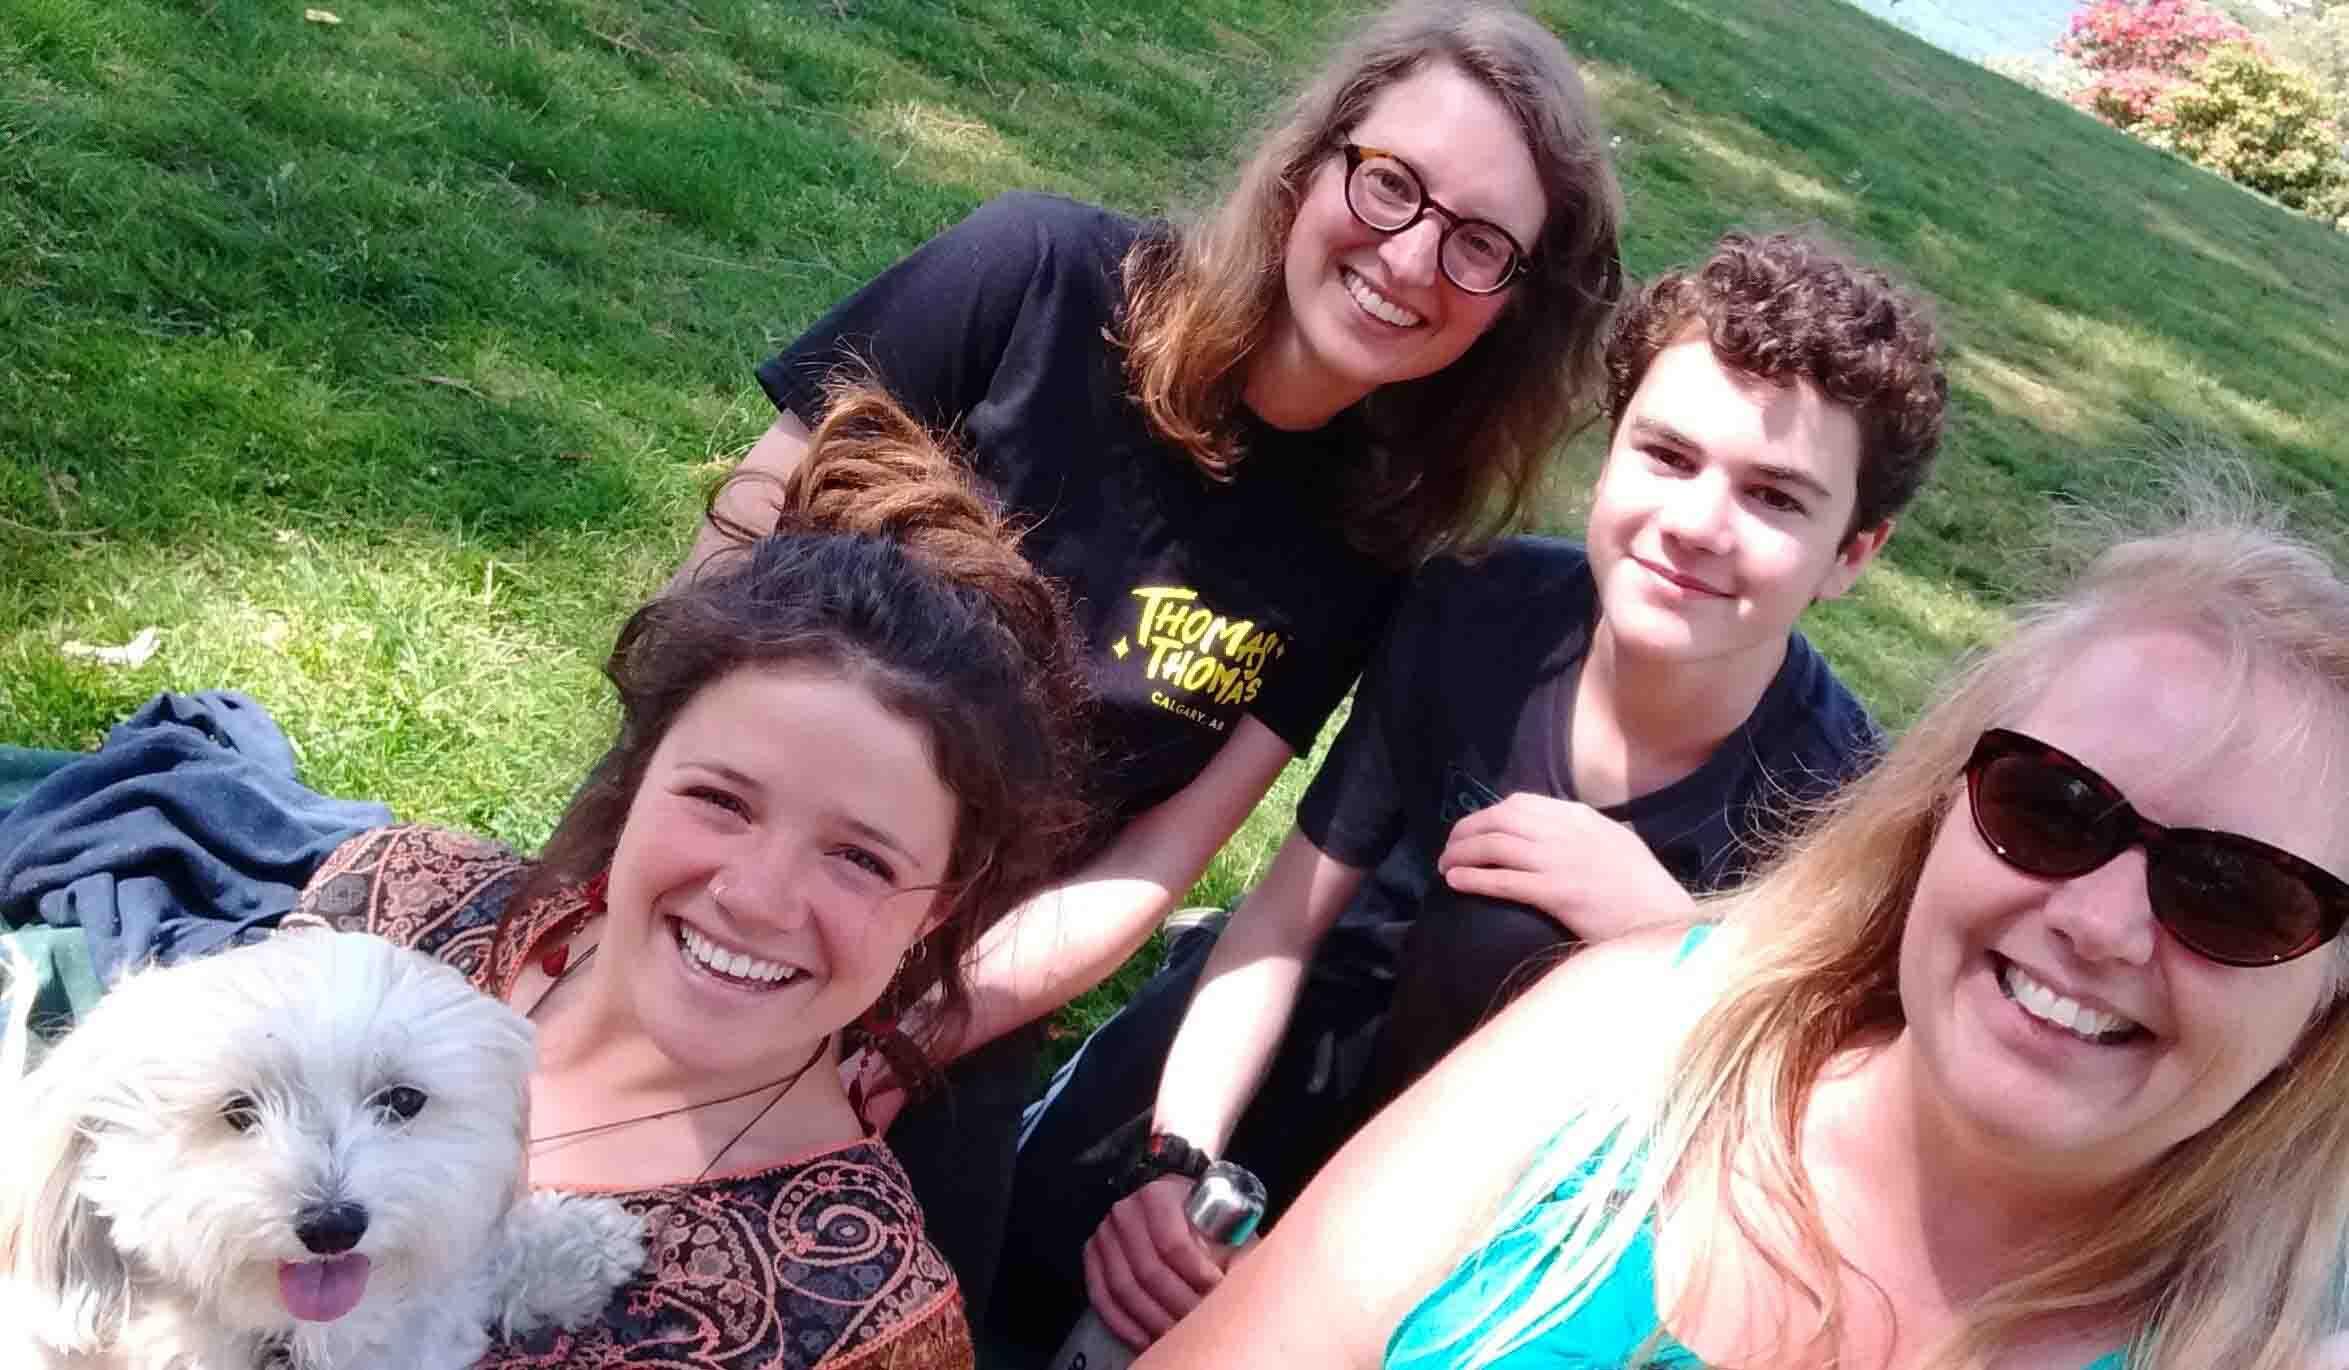 Sue Elrington with (L-R): Sadie the dog, Antonia Paquin, Hannah Gelderman and Finn Kreischer